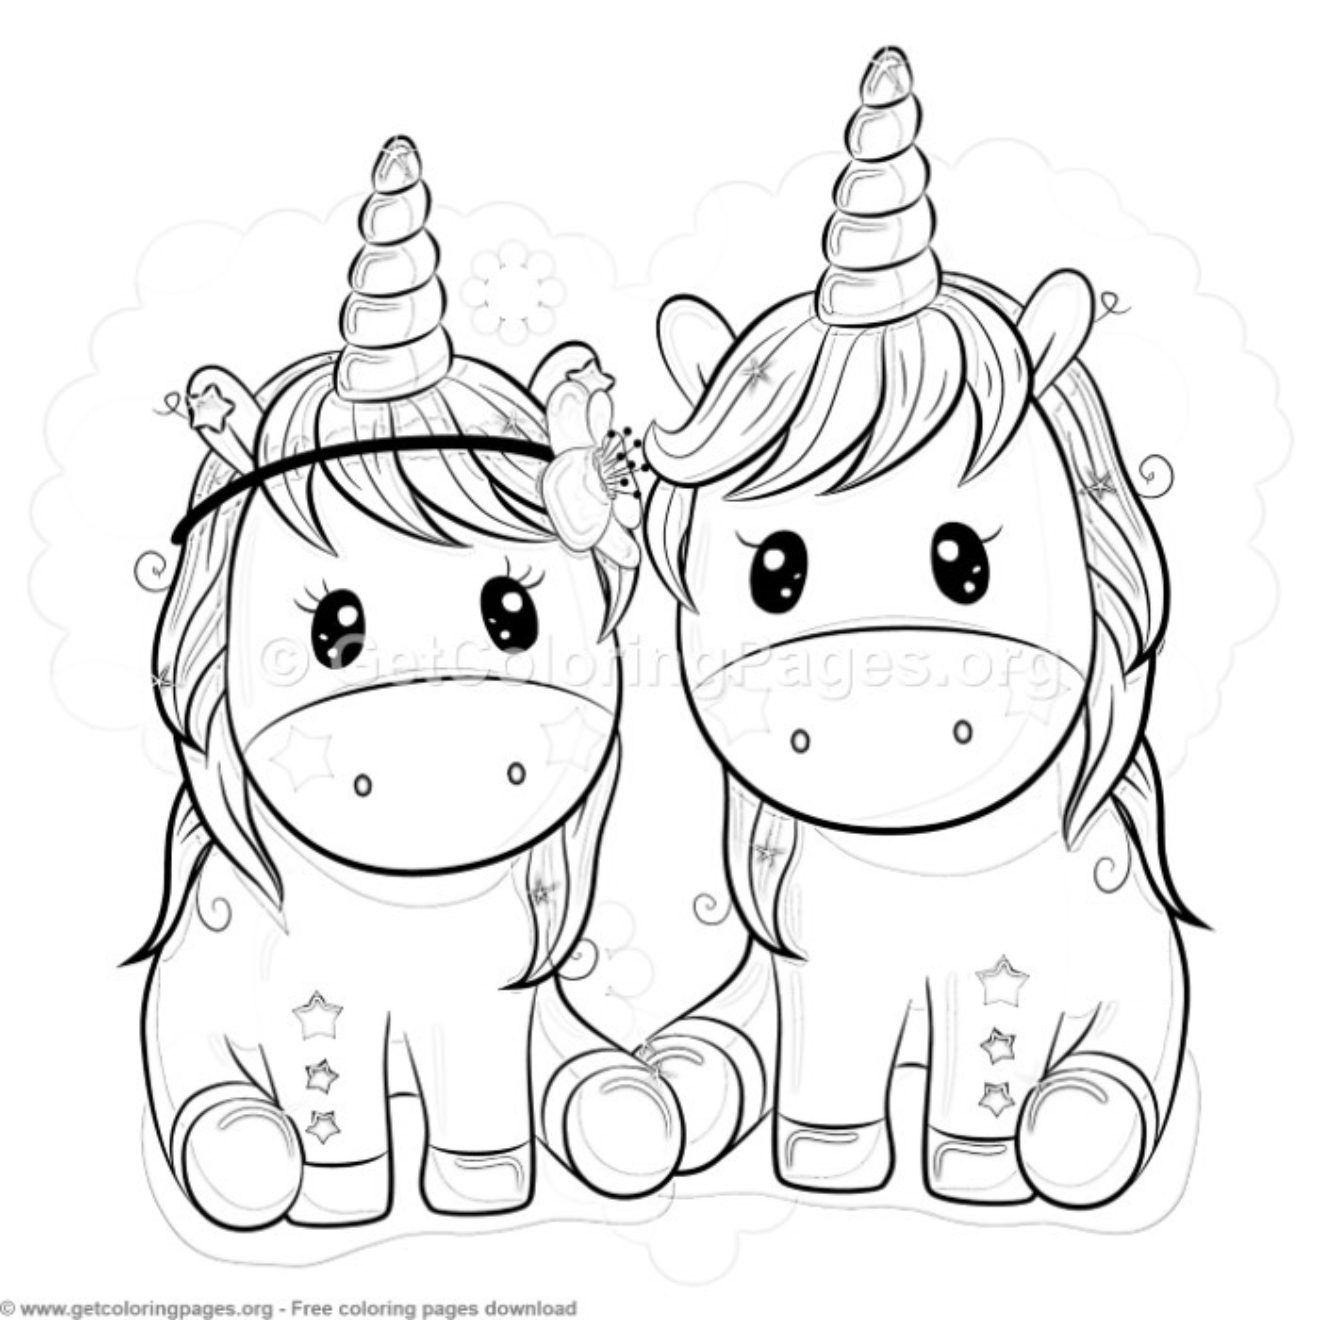 Voodoodles Lots Of Llamas Coloring Page Kids Fun And Stuff